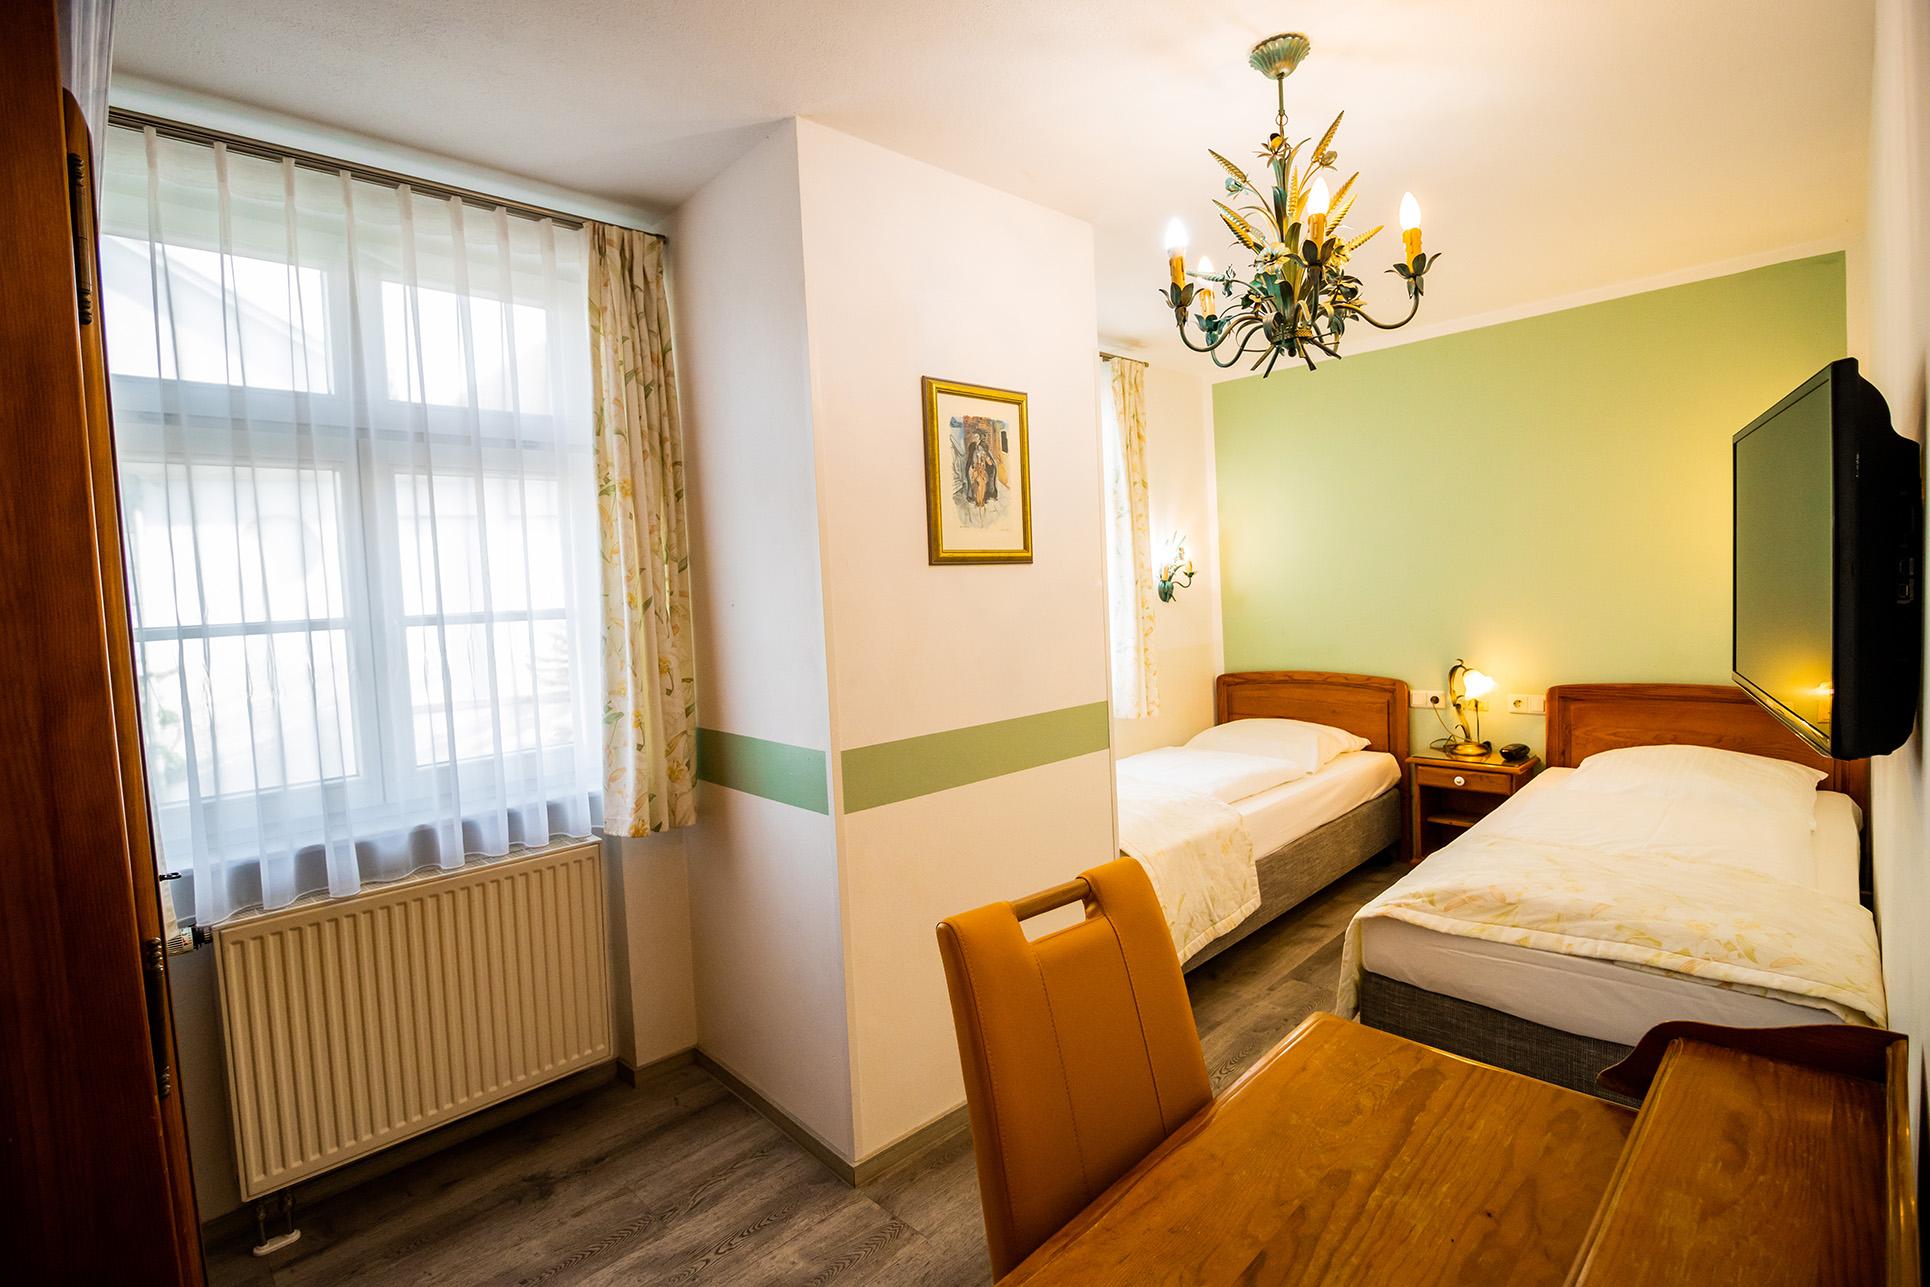 Hotel Rössle Weingarten 2-Bett-Zimmer